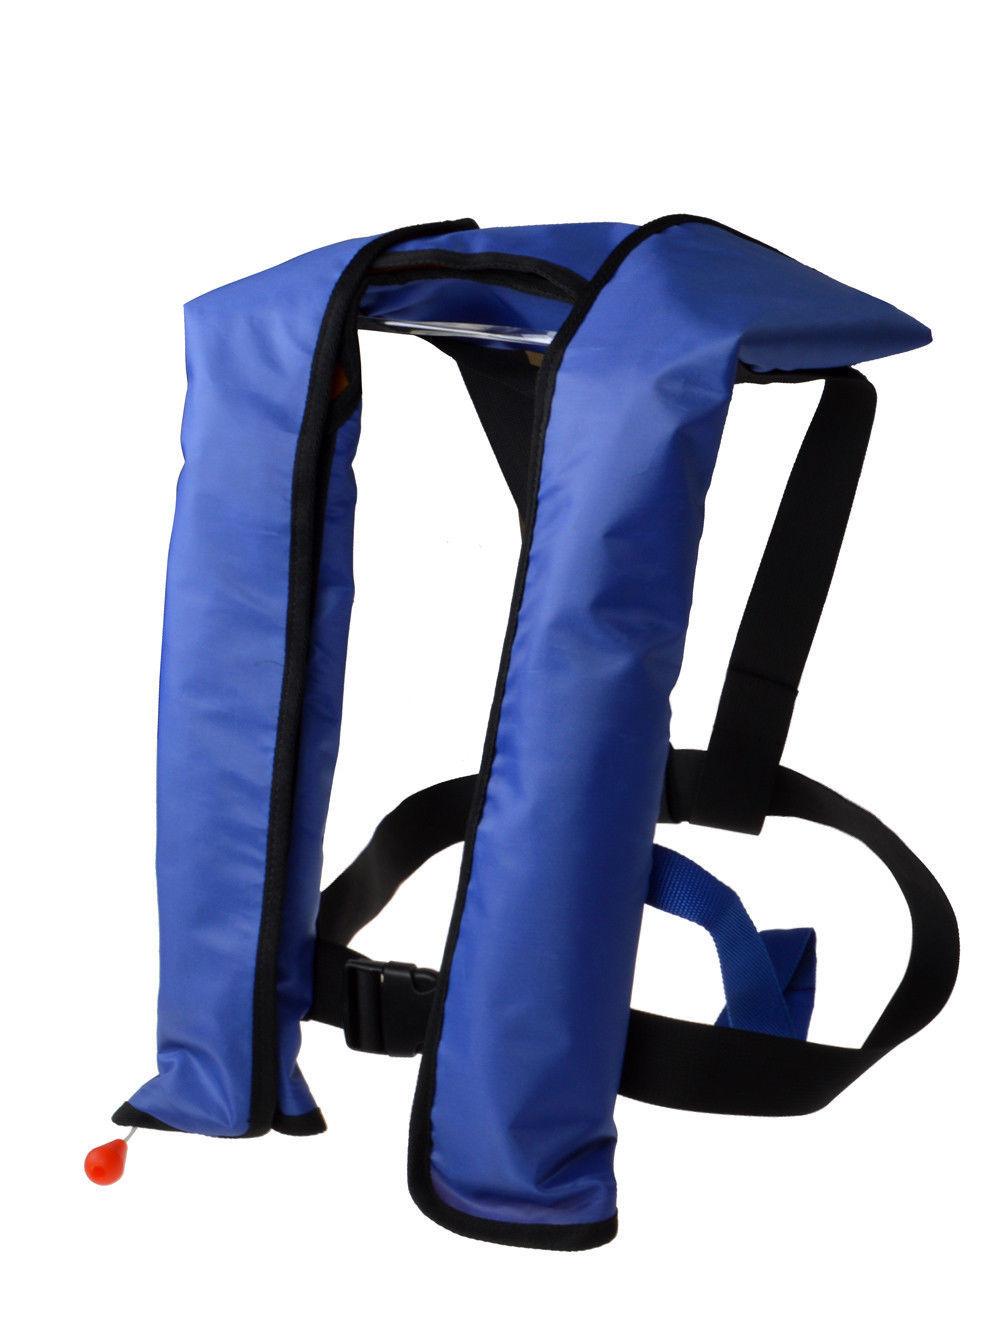 Automatic/Manuel Inflatable Life Jacket Vest Survival Personal Floatation(China (Mainland))